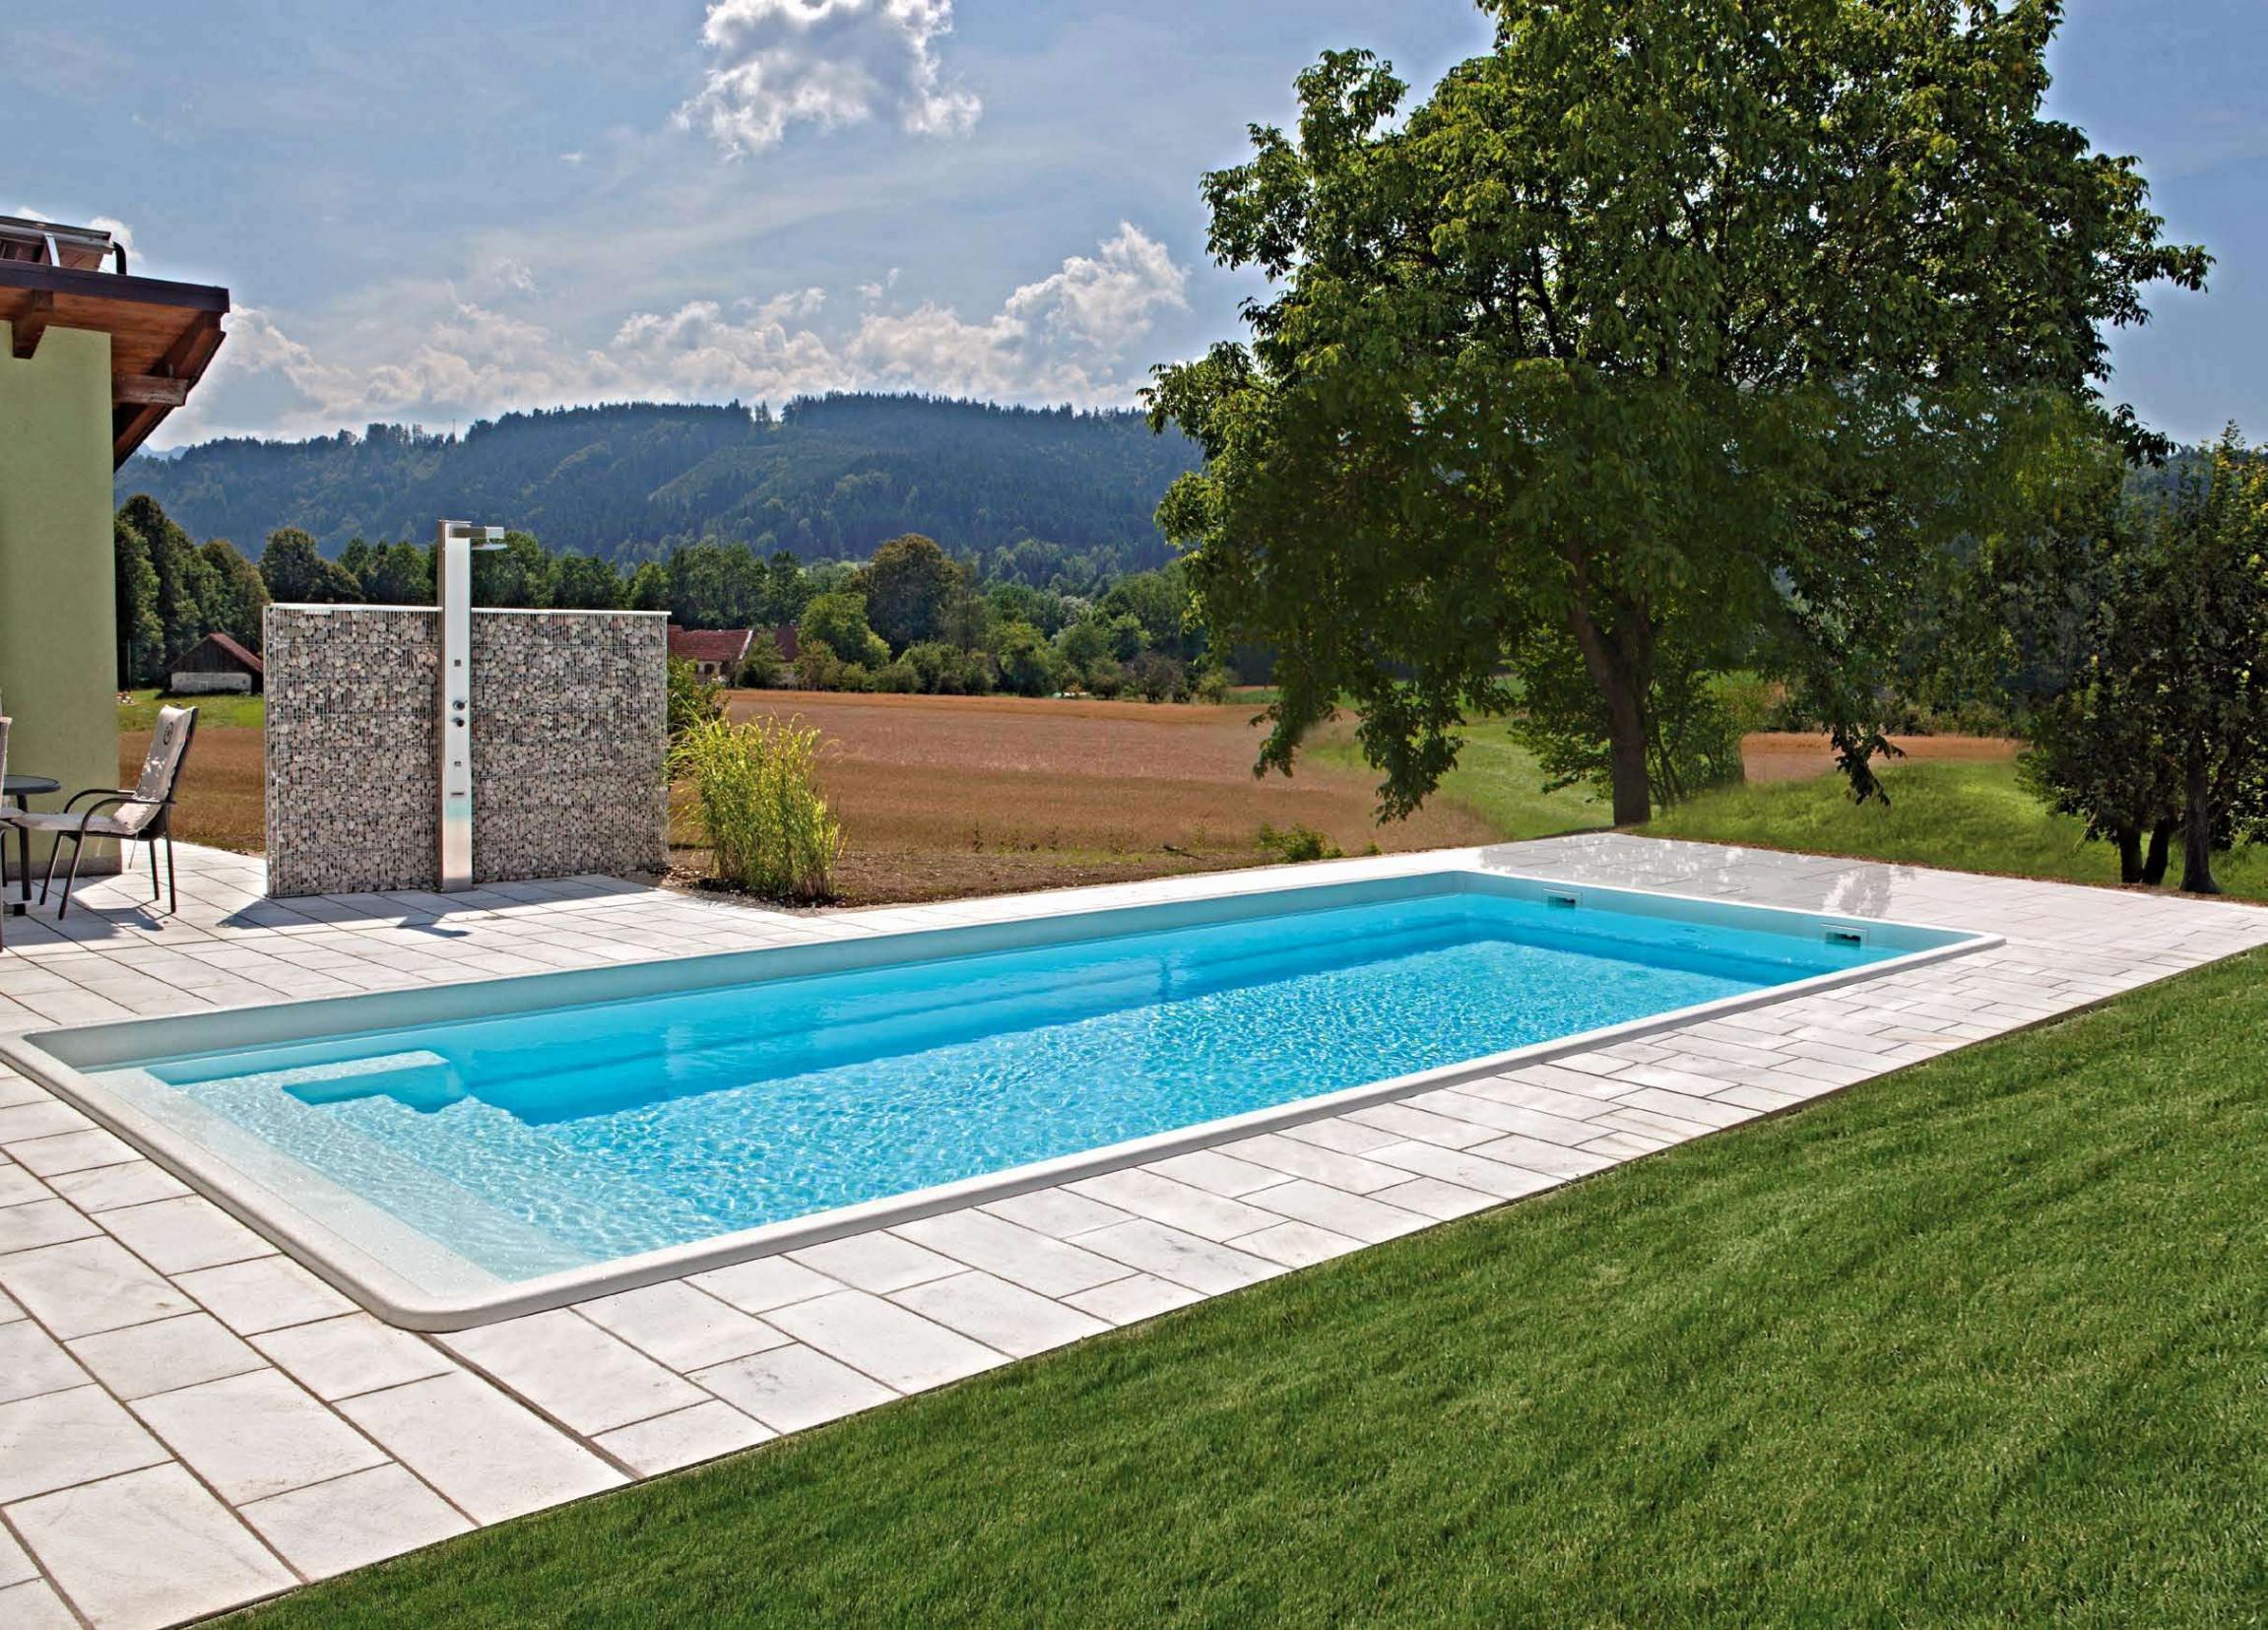 gfk pools schon swimmingpool garten kletterturm garten 0d tags pool bilder inspiration pool bilder inspiration